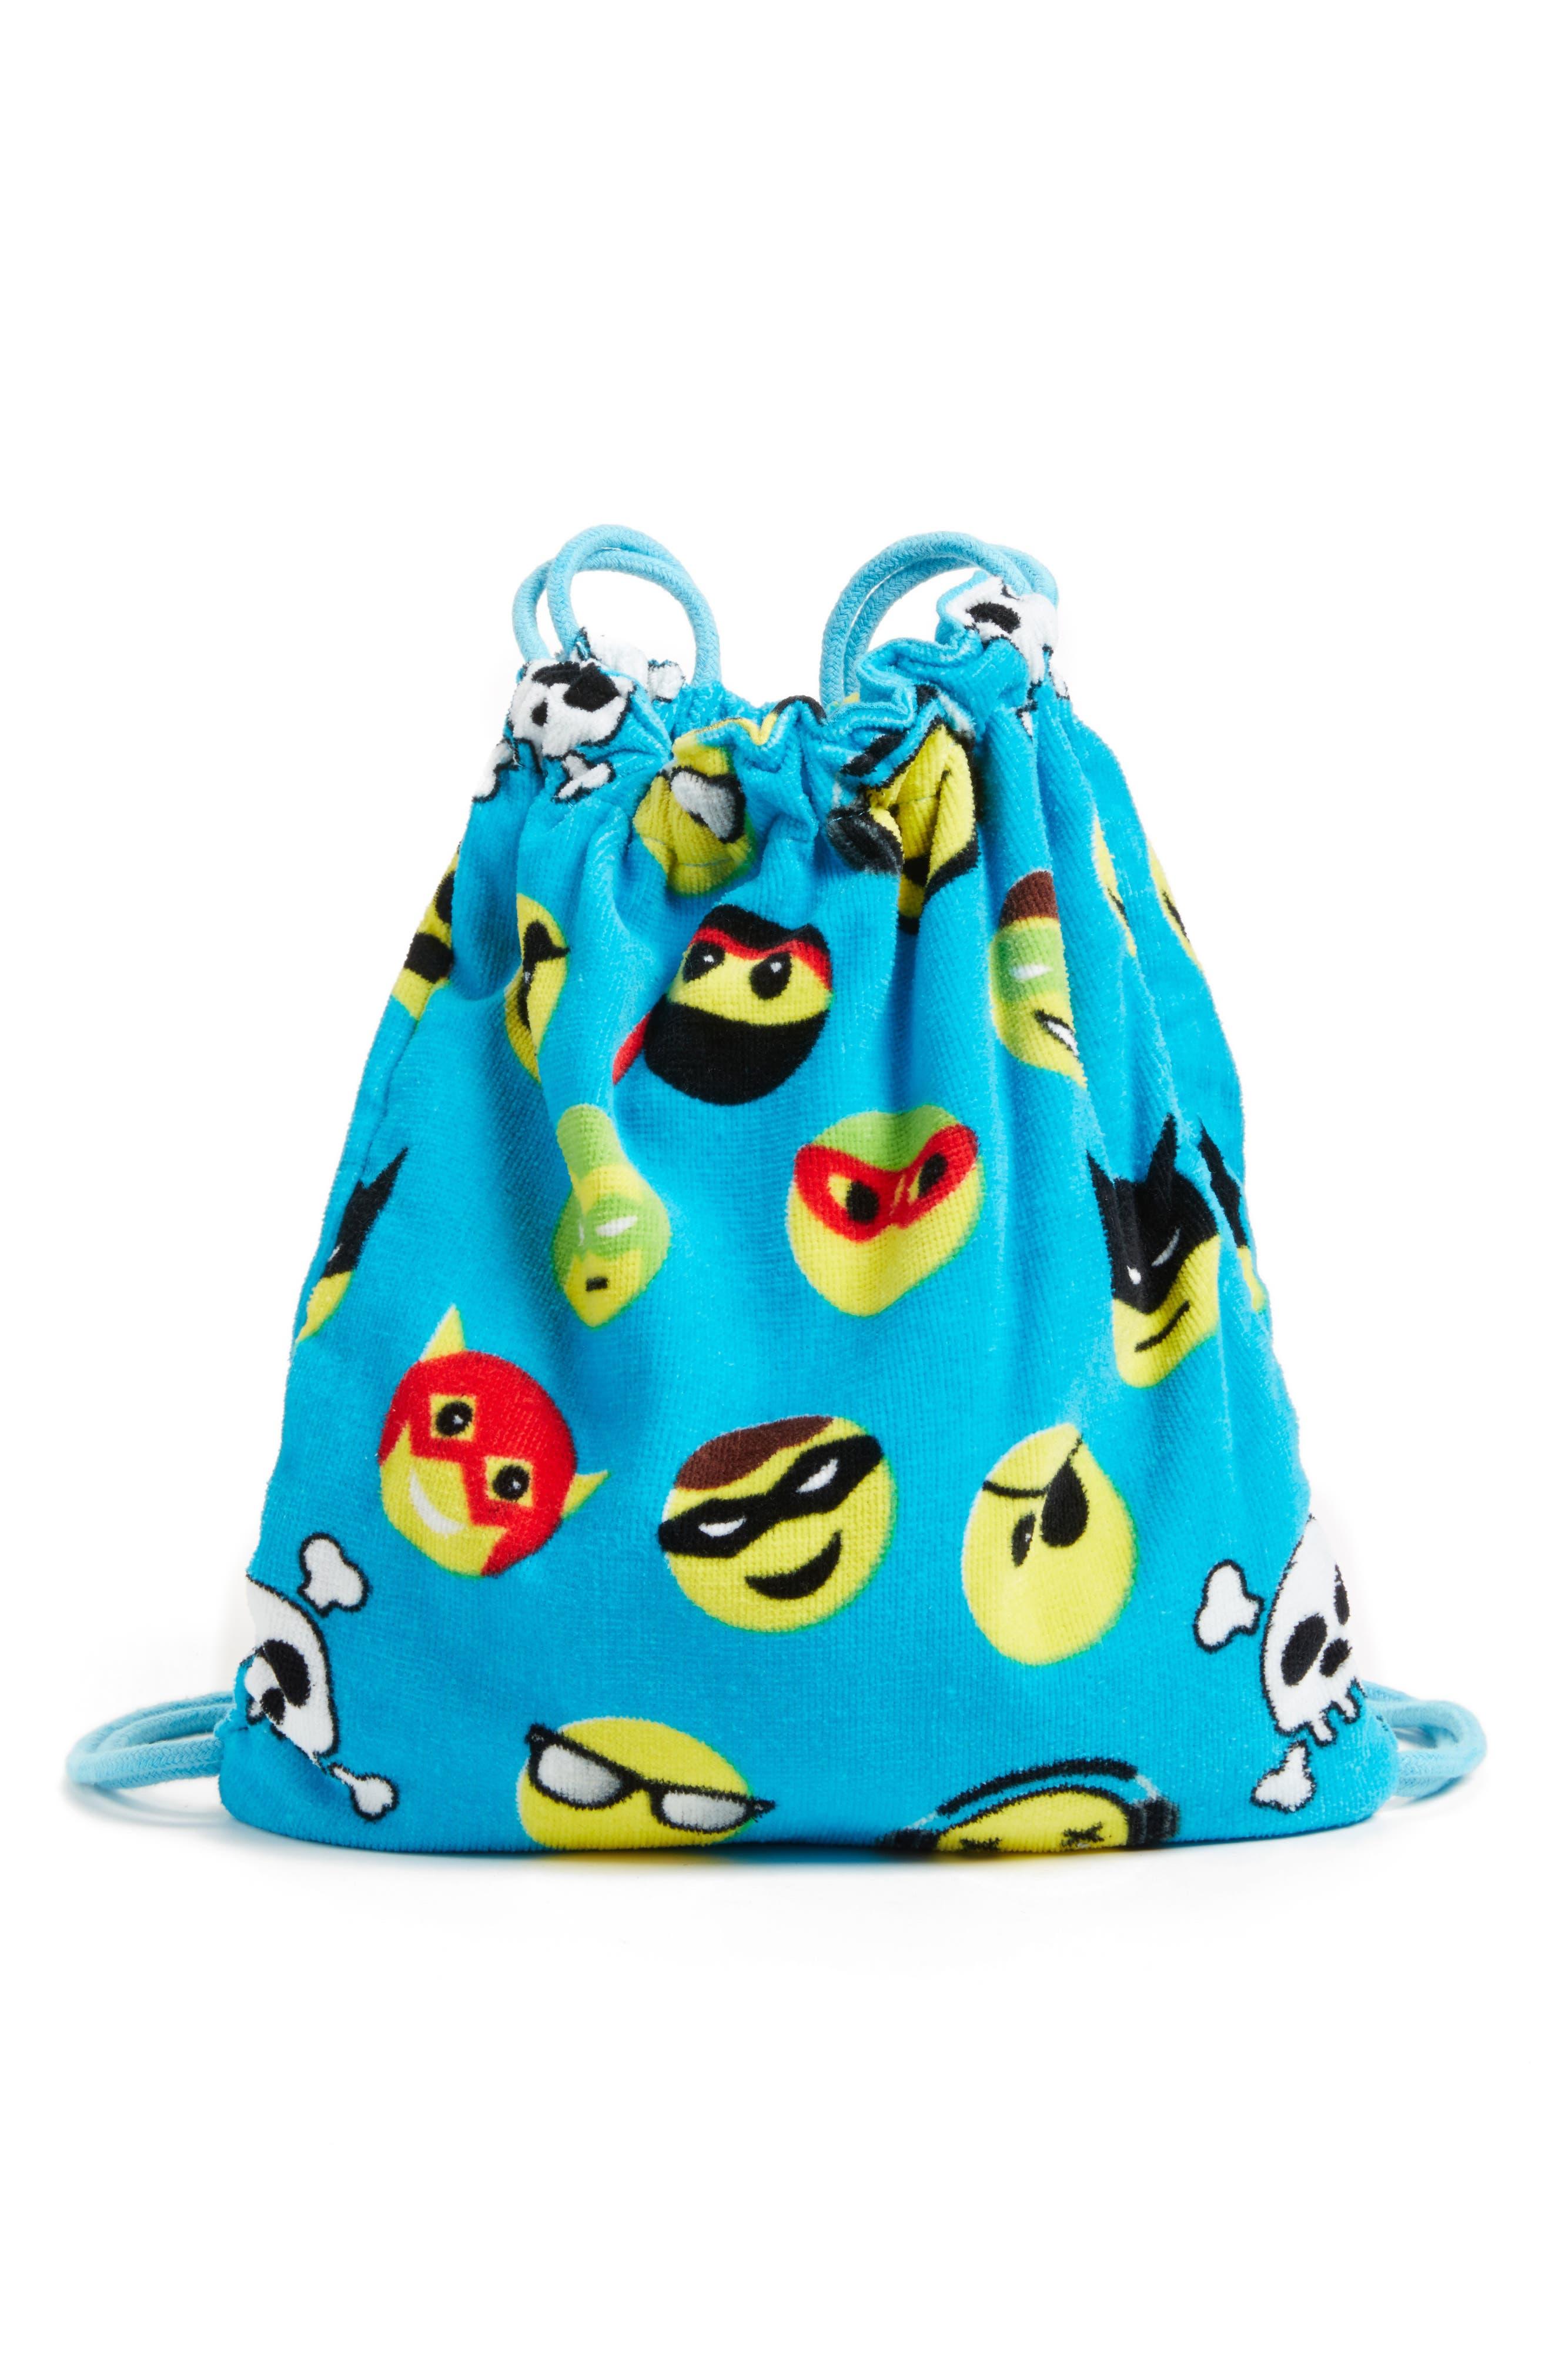 Emoji Towel Drawstring Bag,                             Main thumbnail 1, color,                             401